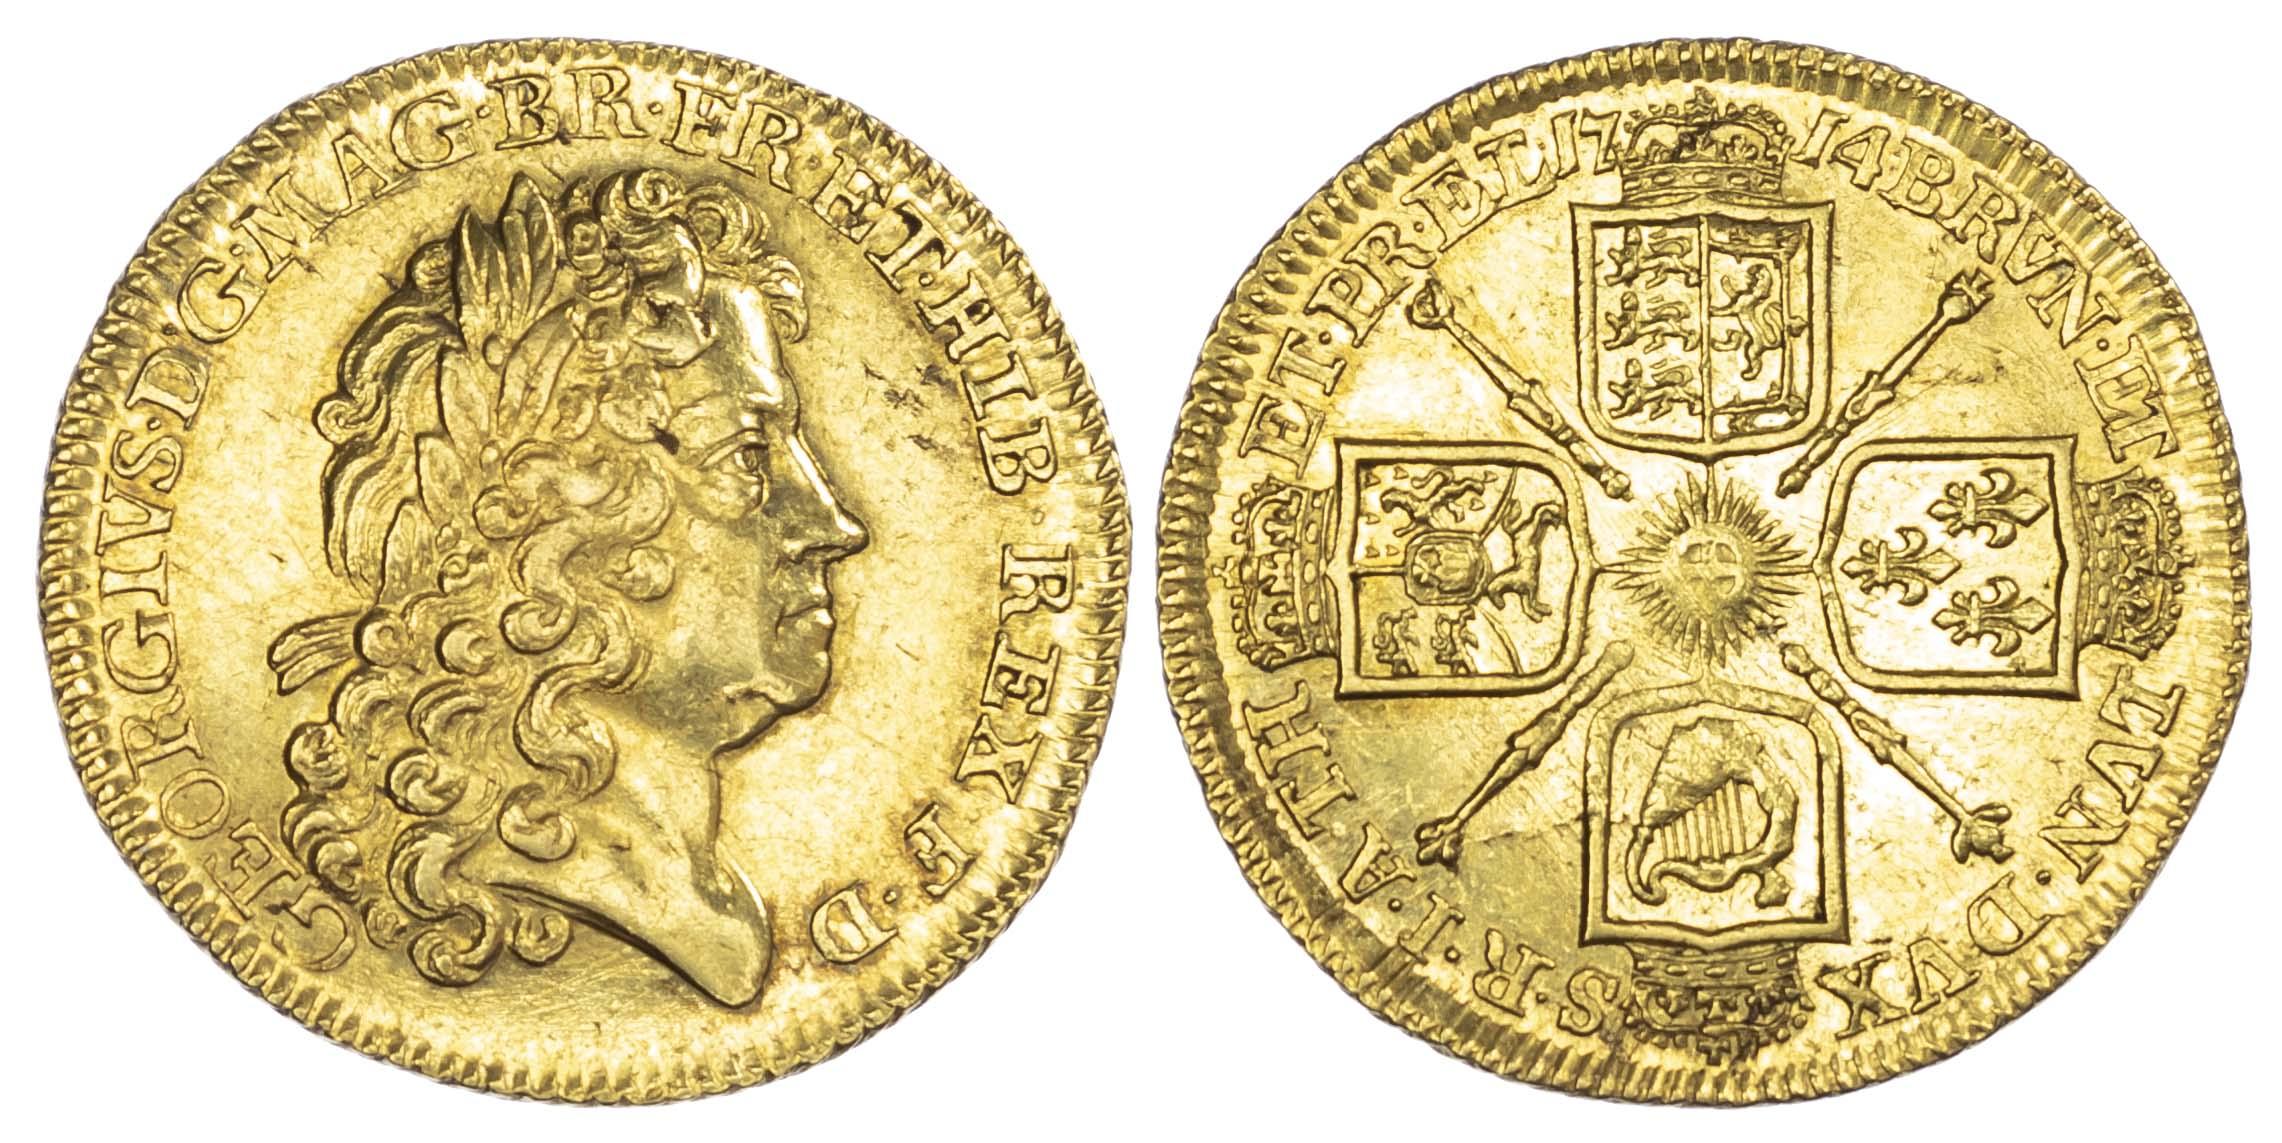 George I (1714-27), Guinea, 1714 'Prince Elector' type, first laureate head